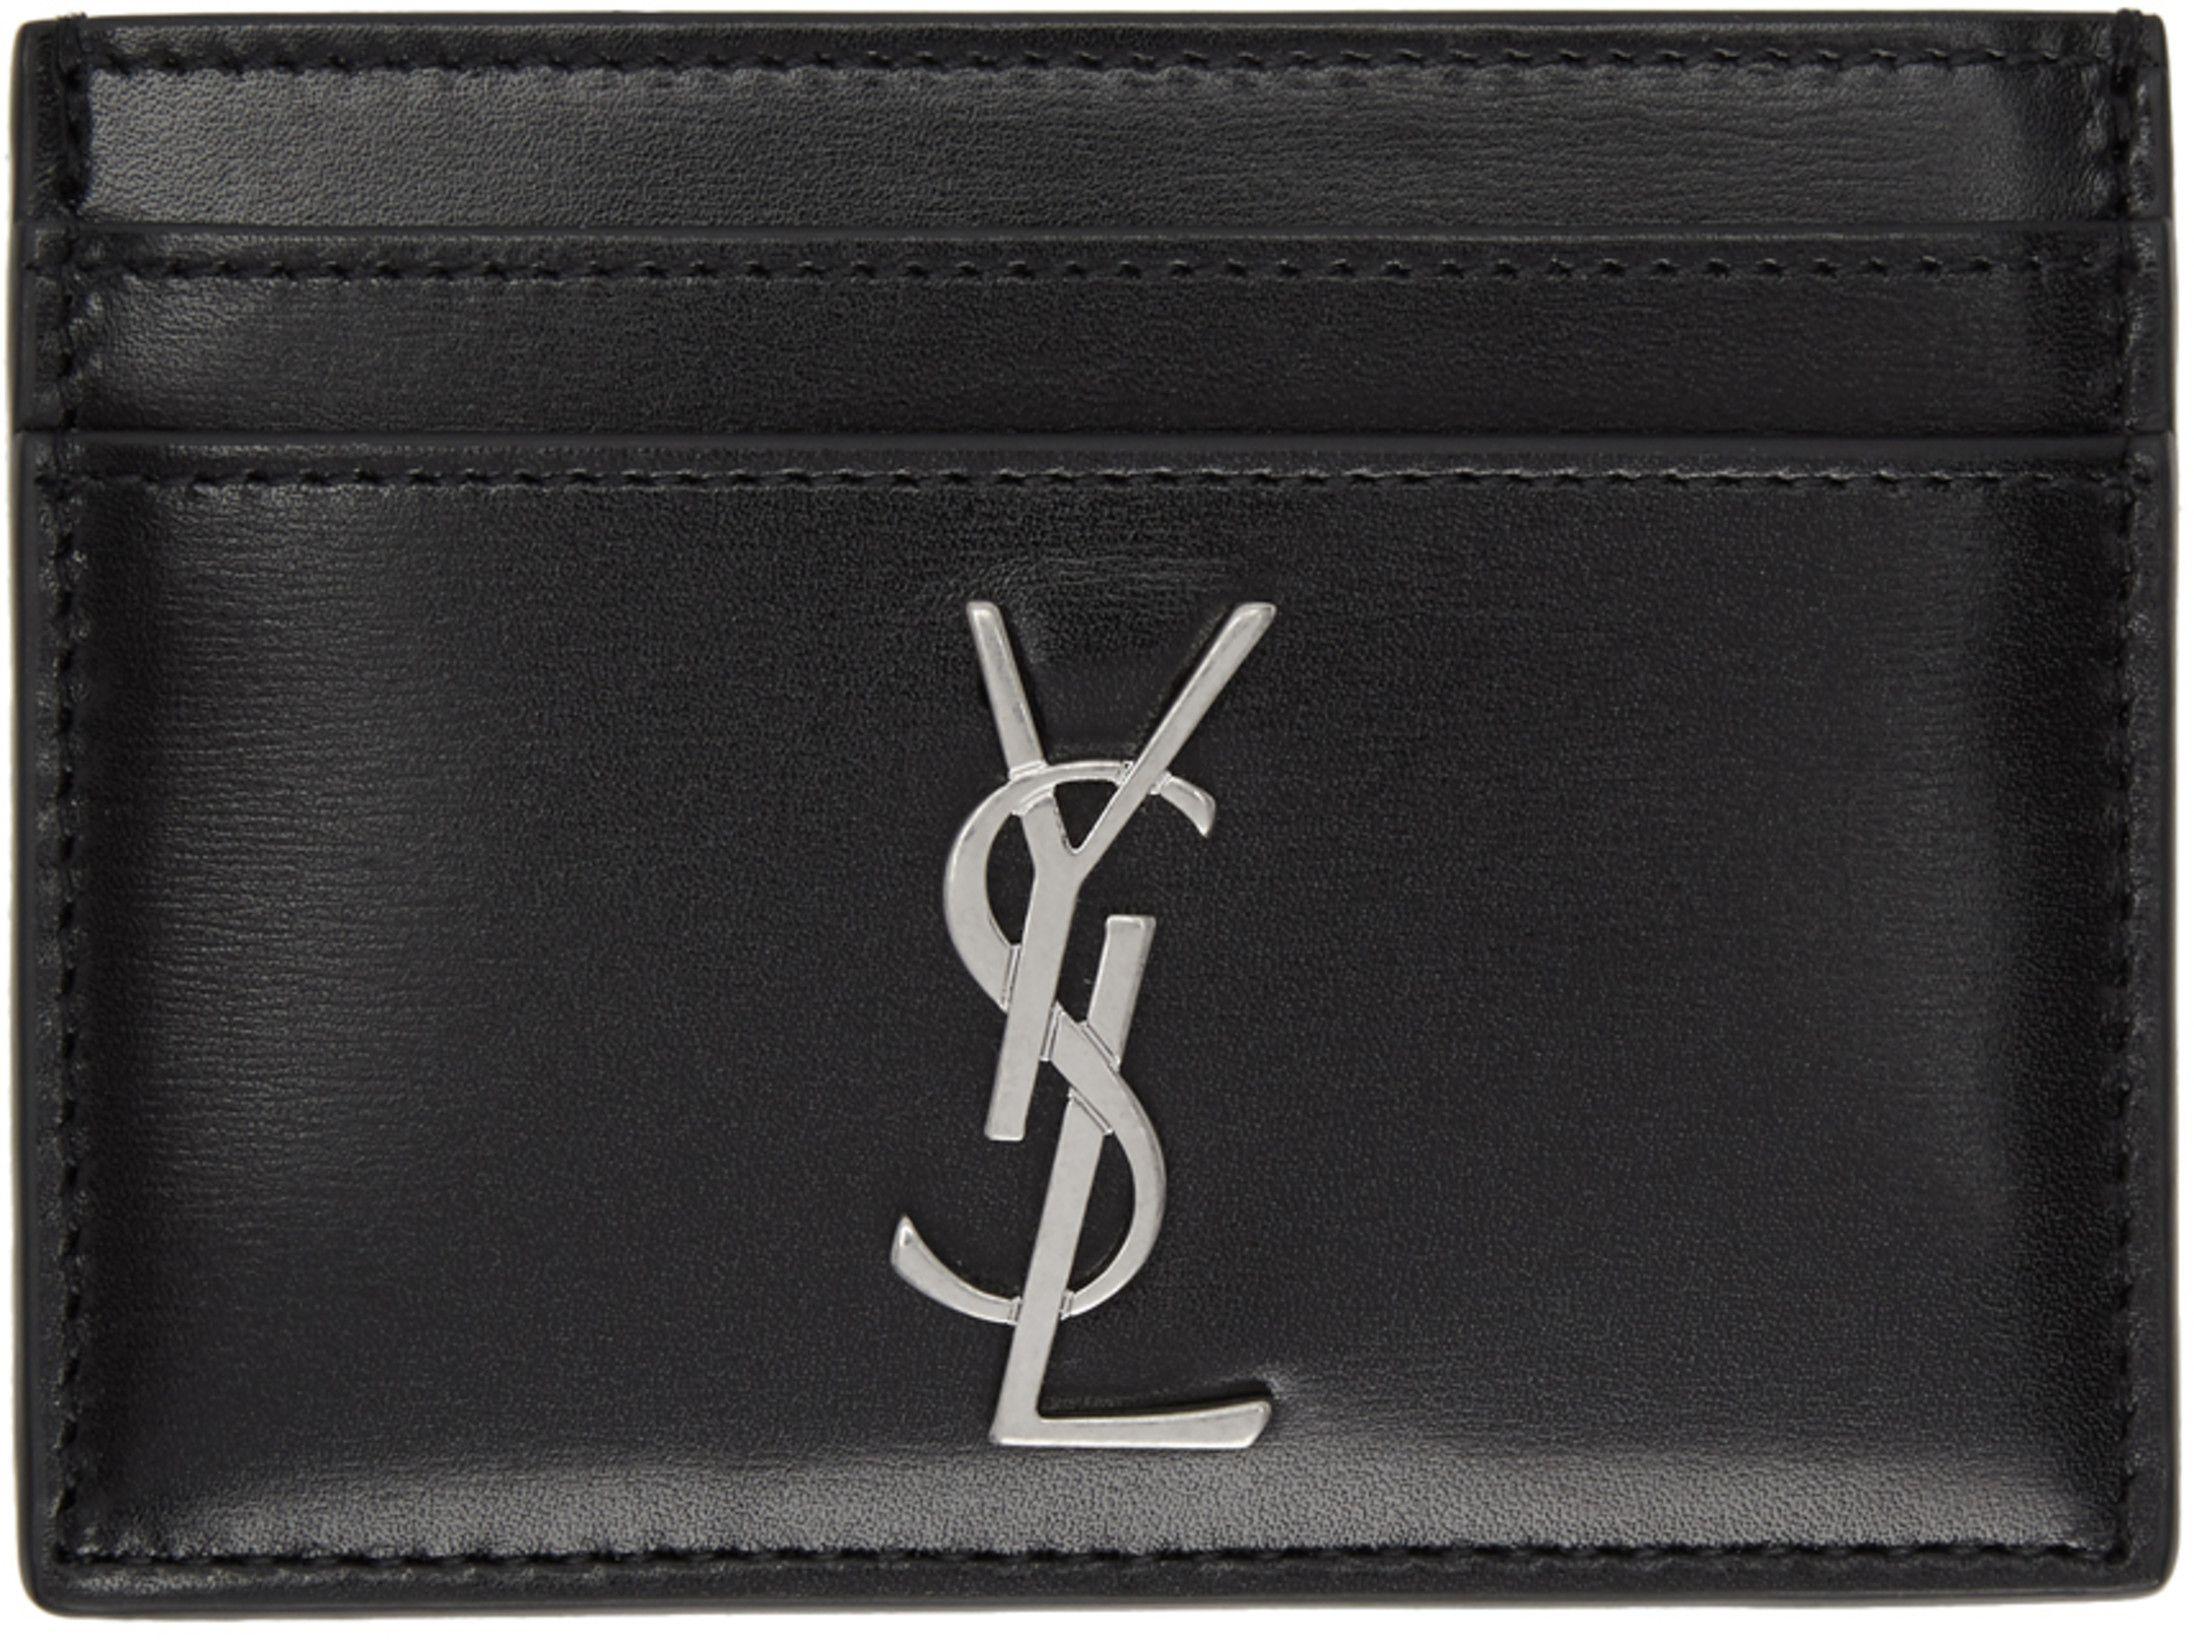 d6d011454b Saint Laurent - Black Monogramme Card Holder | list | Ysl card ...